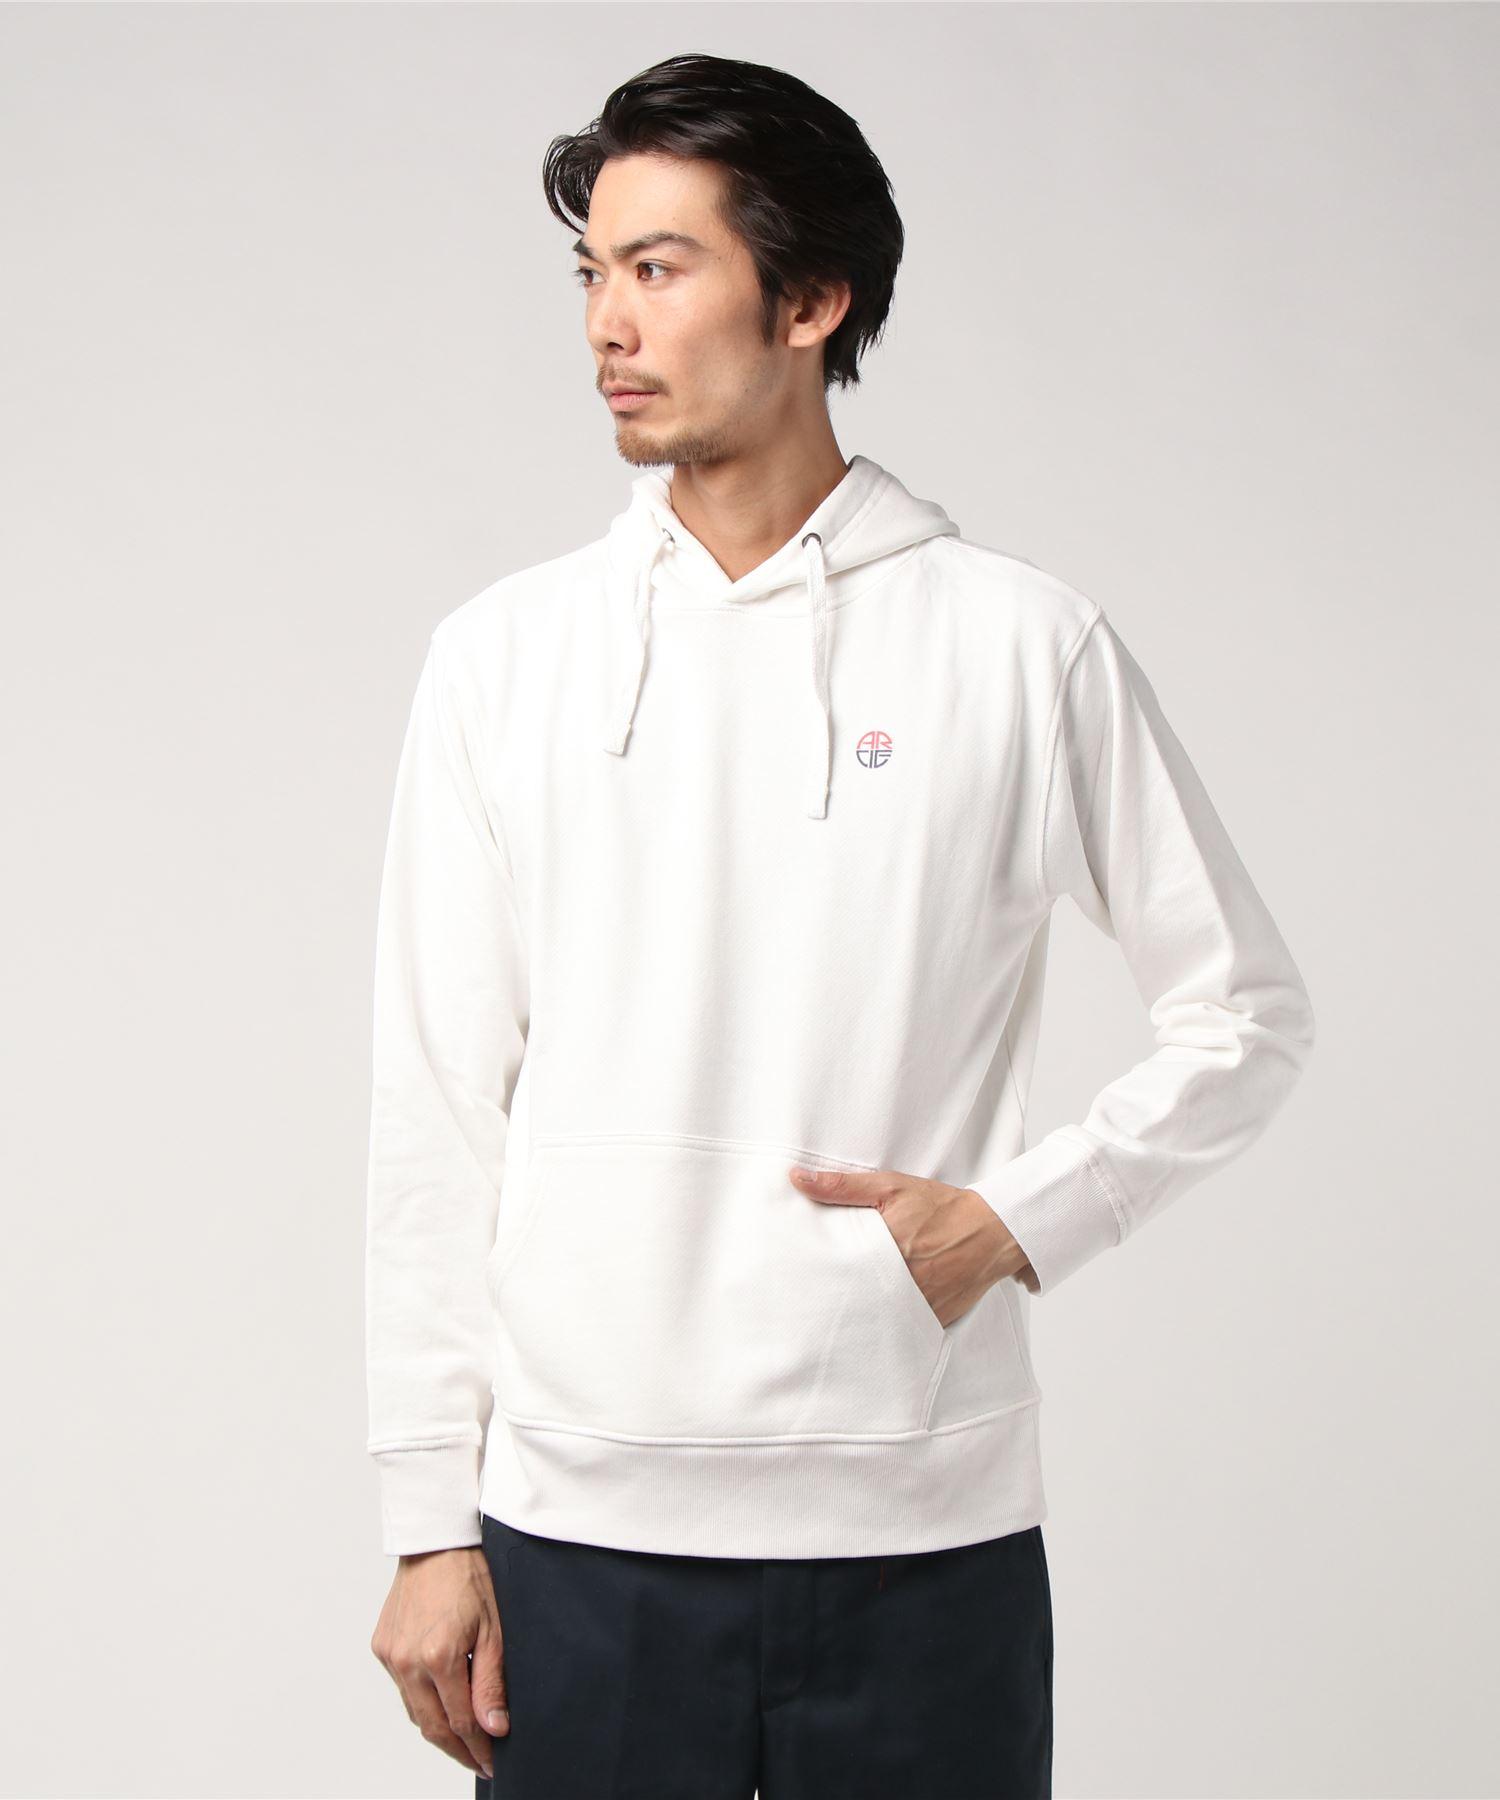 AMERICAN RAG CIE ARC Stencil Logo Print Hooded Sweatshirt/アメリカンラグシー ARCステンシルロゴプリントフードパーカ